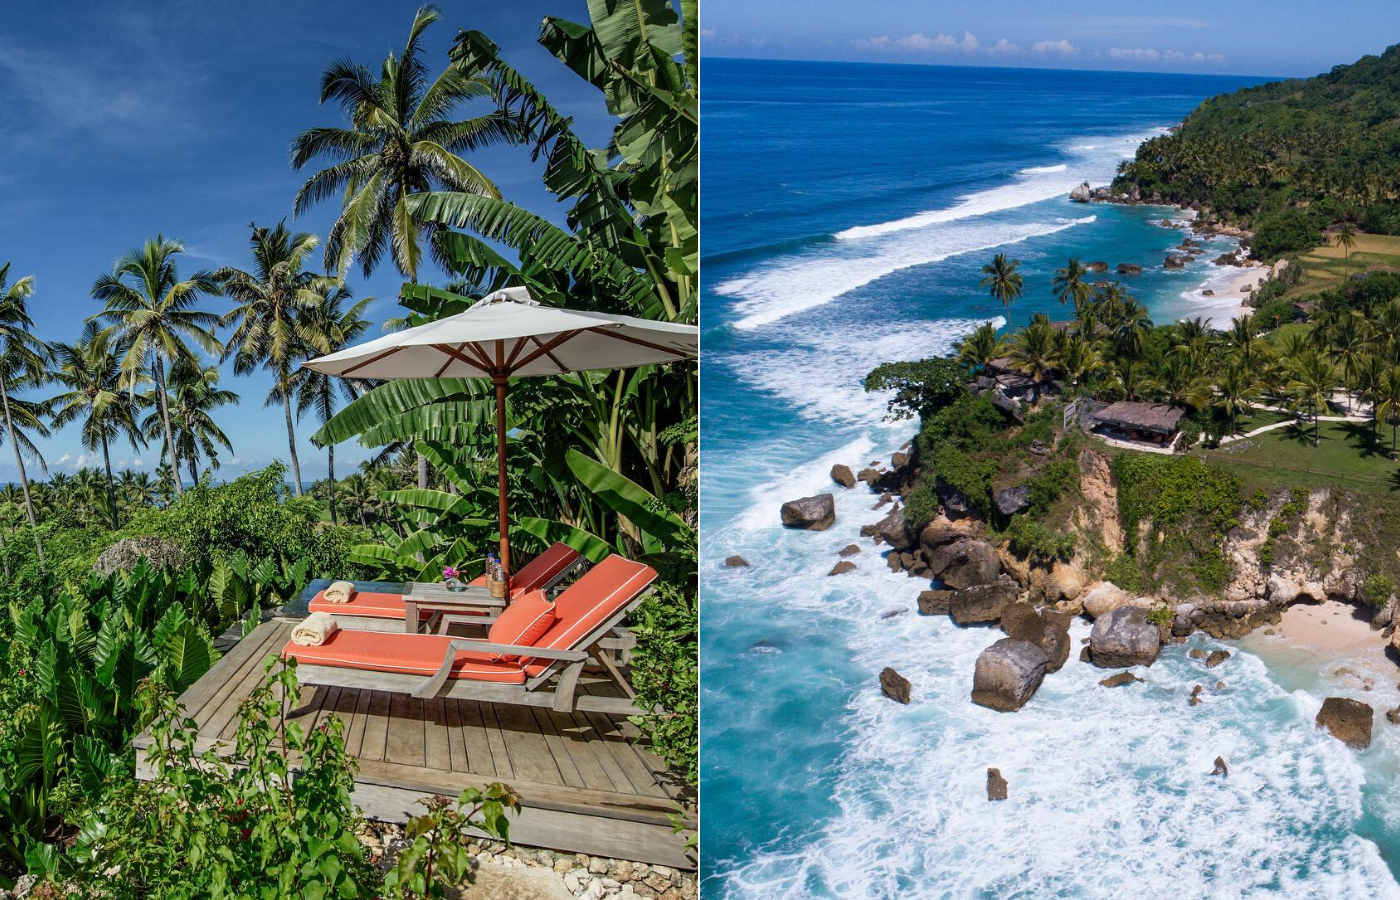 nihi sumba island   private island resorts in Southeast Asia